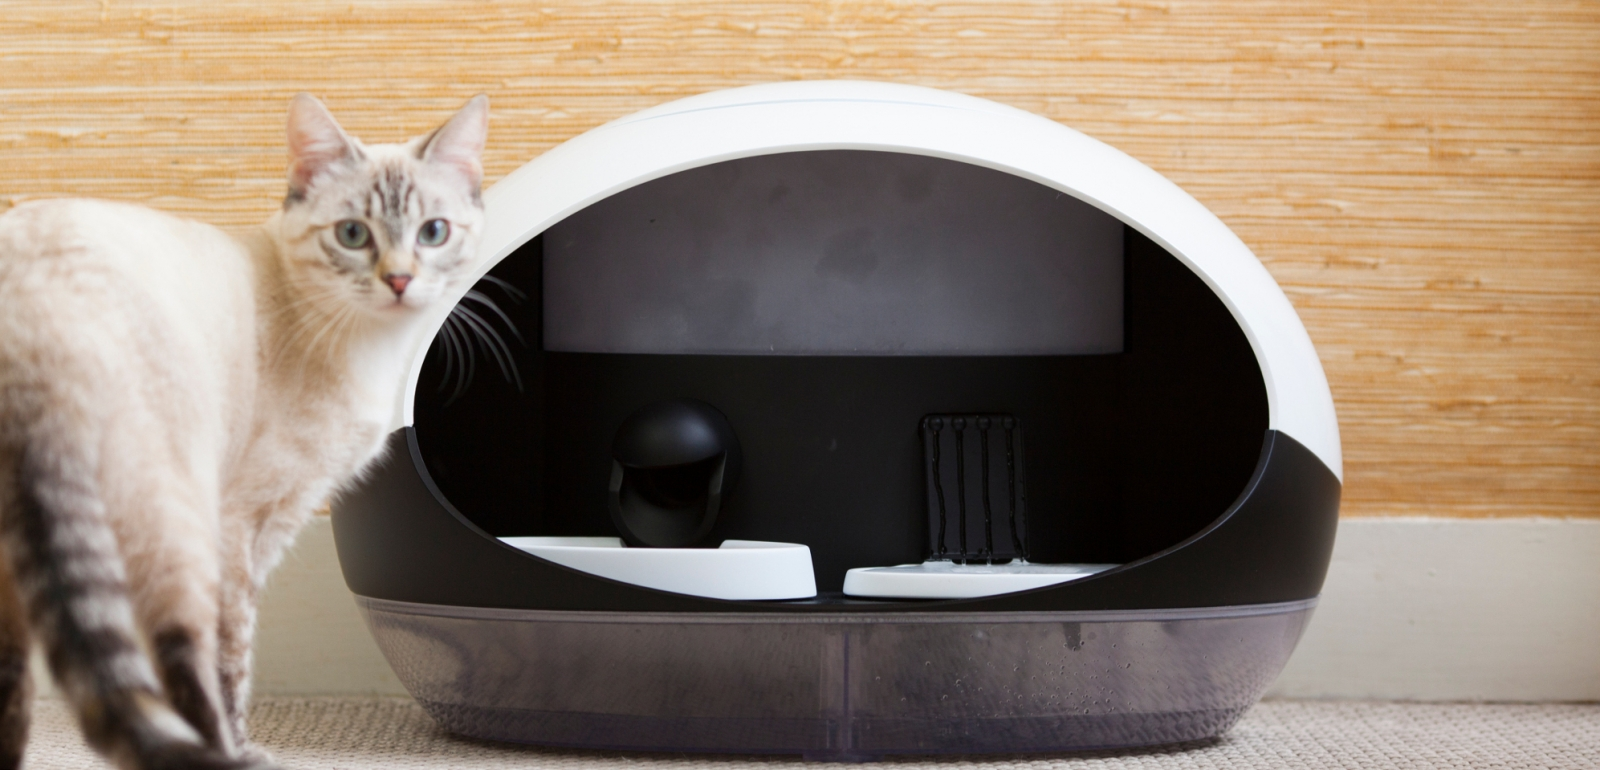 Catspad smart cat feeder